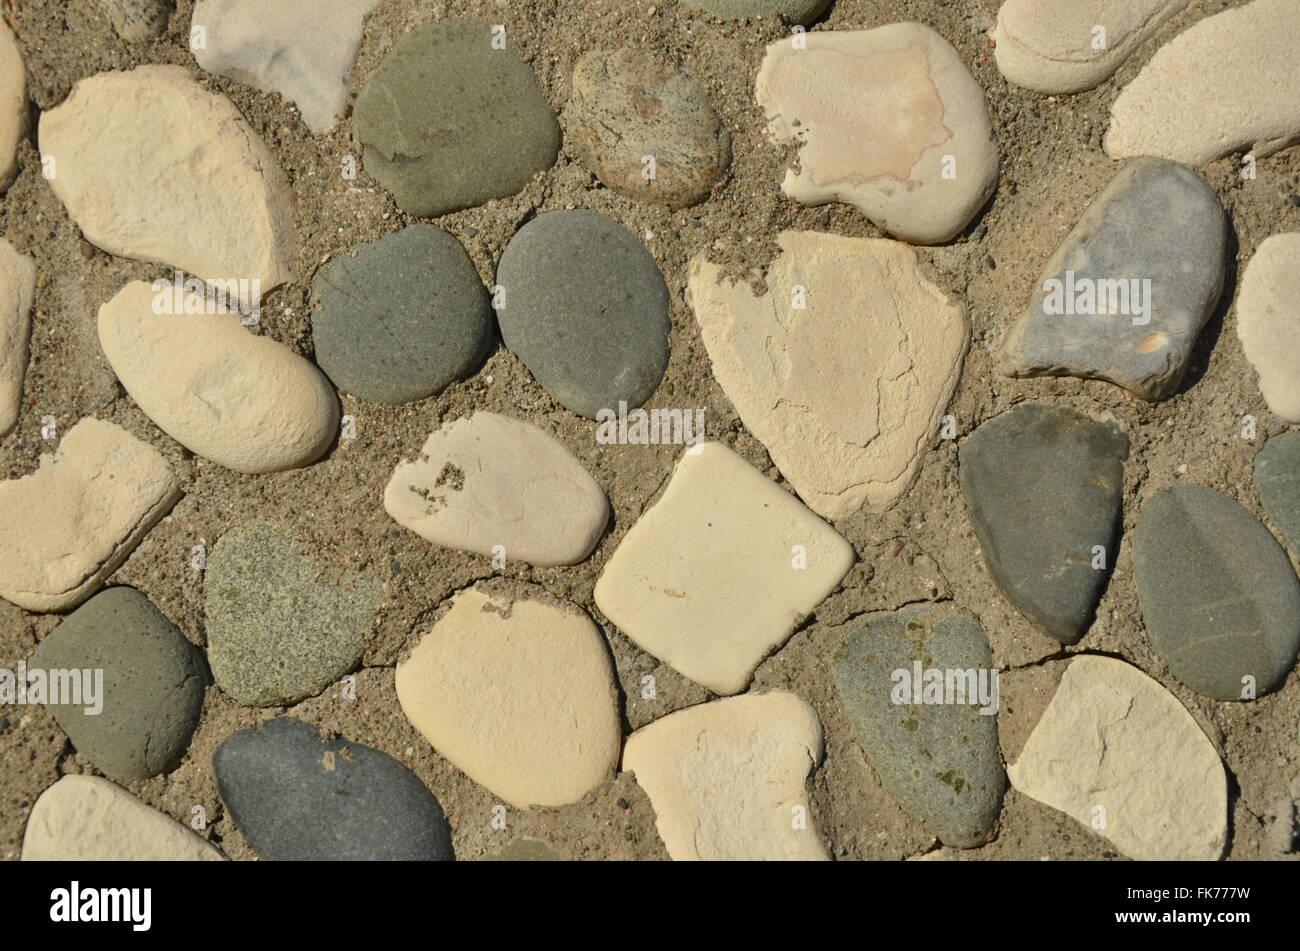 Pebble Mosaic Art Or Artwork Stock Photos & Pebble Mosaic Art Or ...